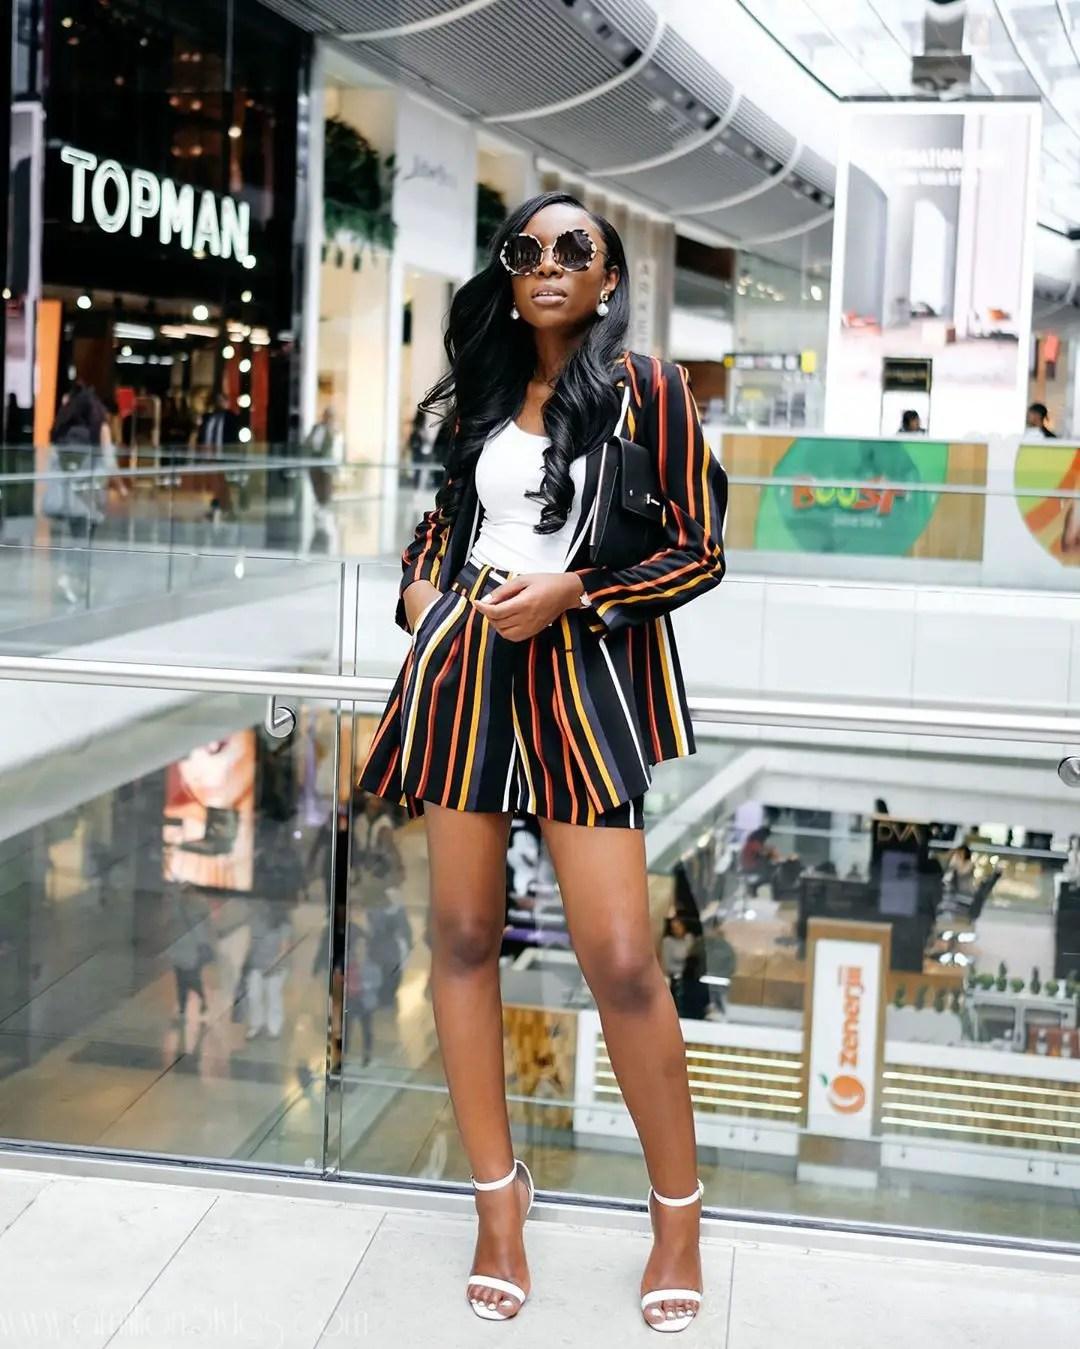 Amillionstyles Street Style Of The Day: Alexandriah Sho-Silva